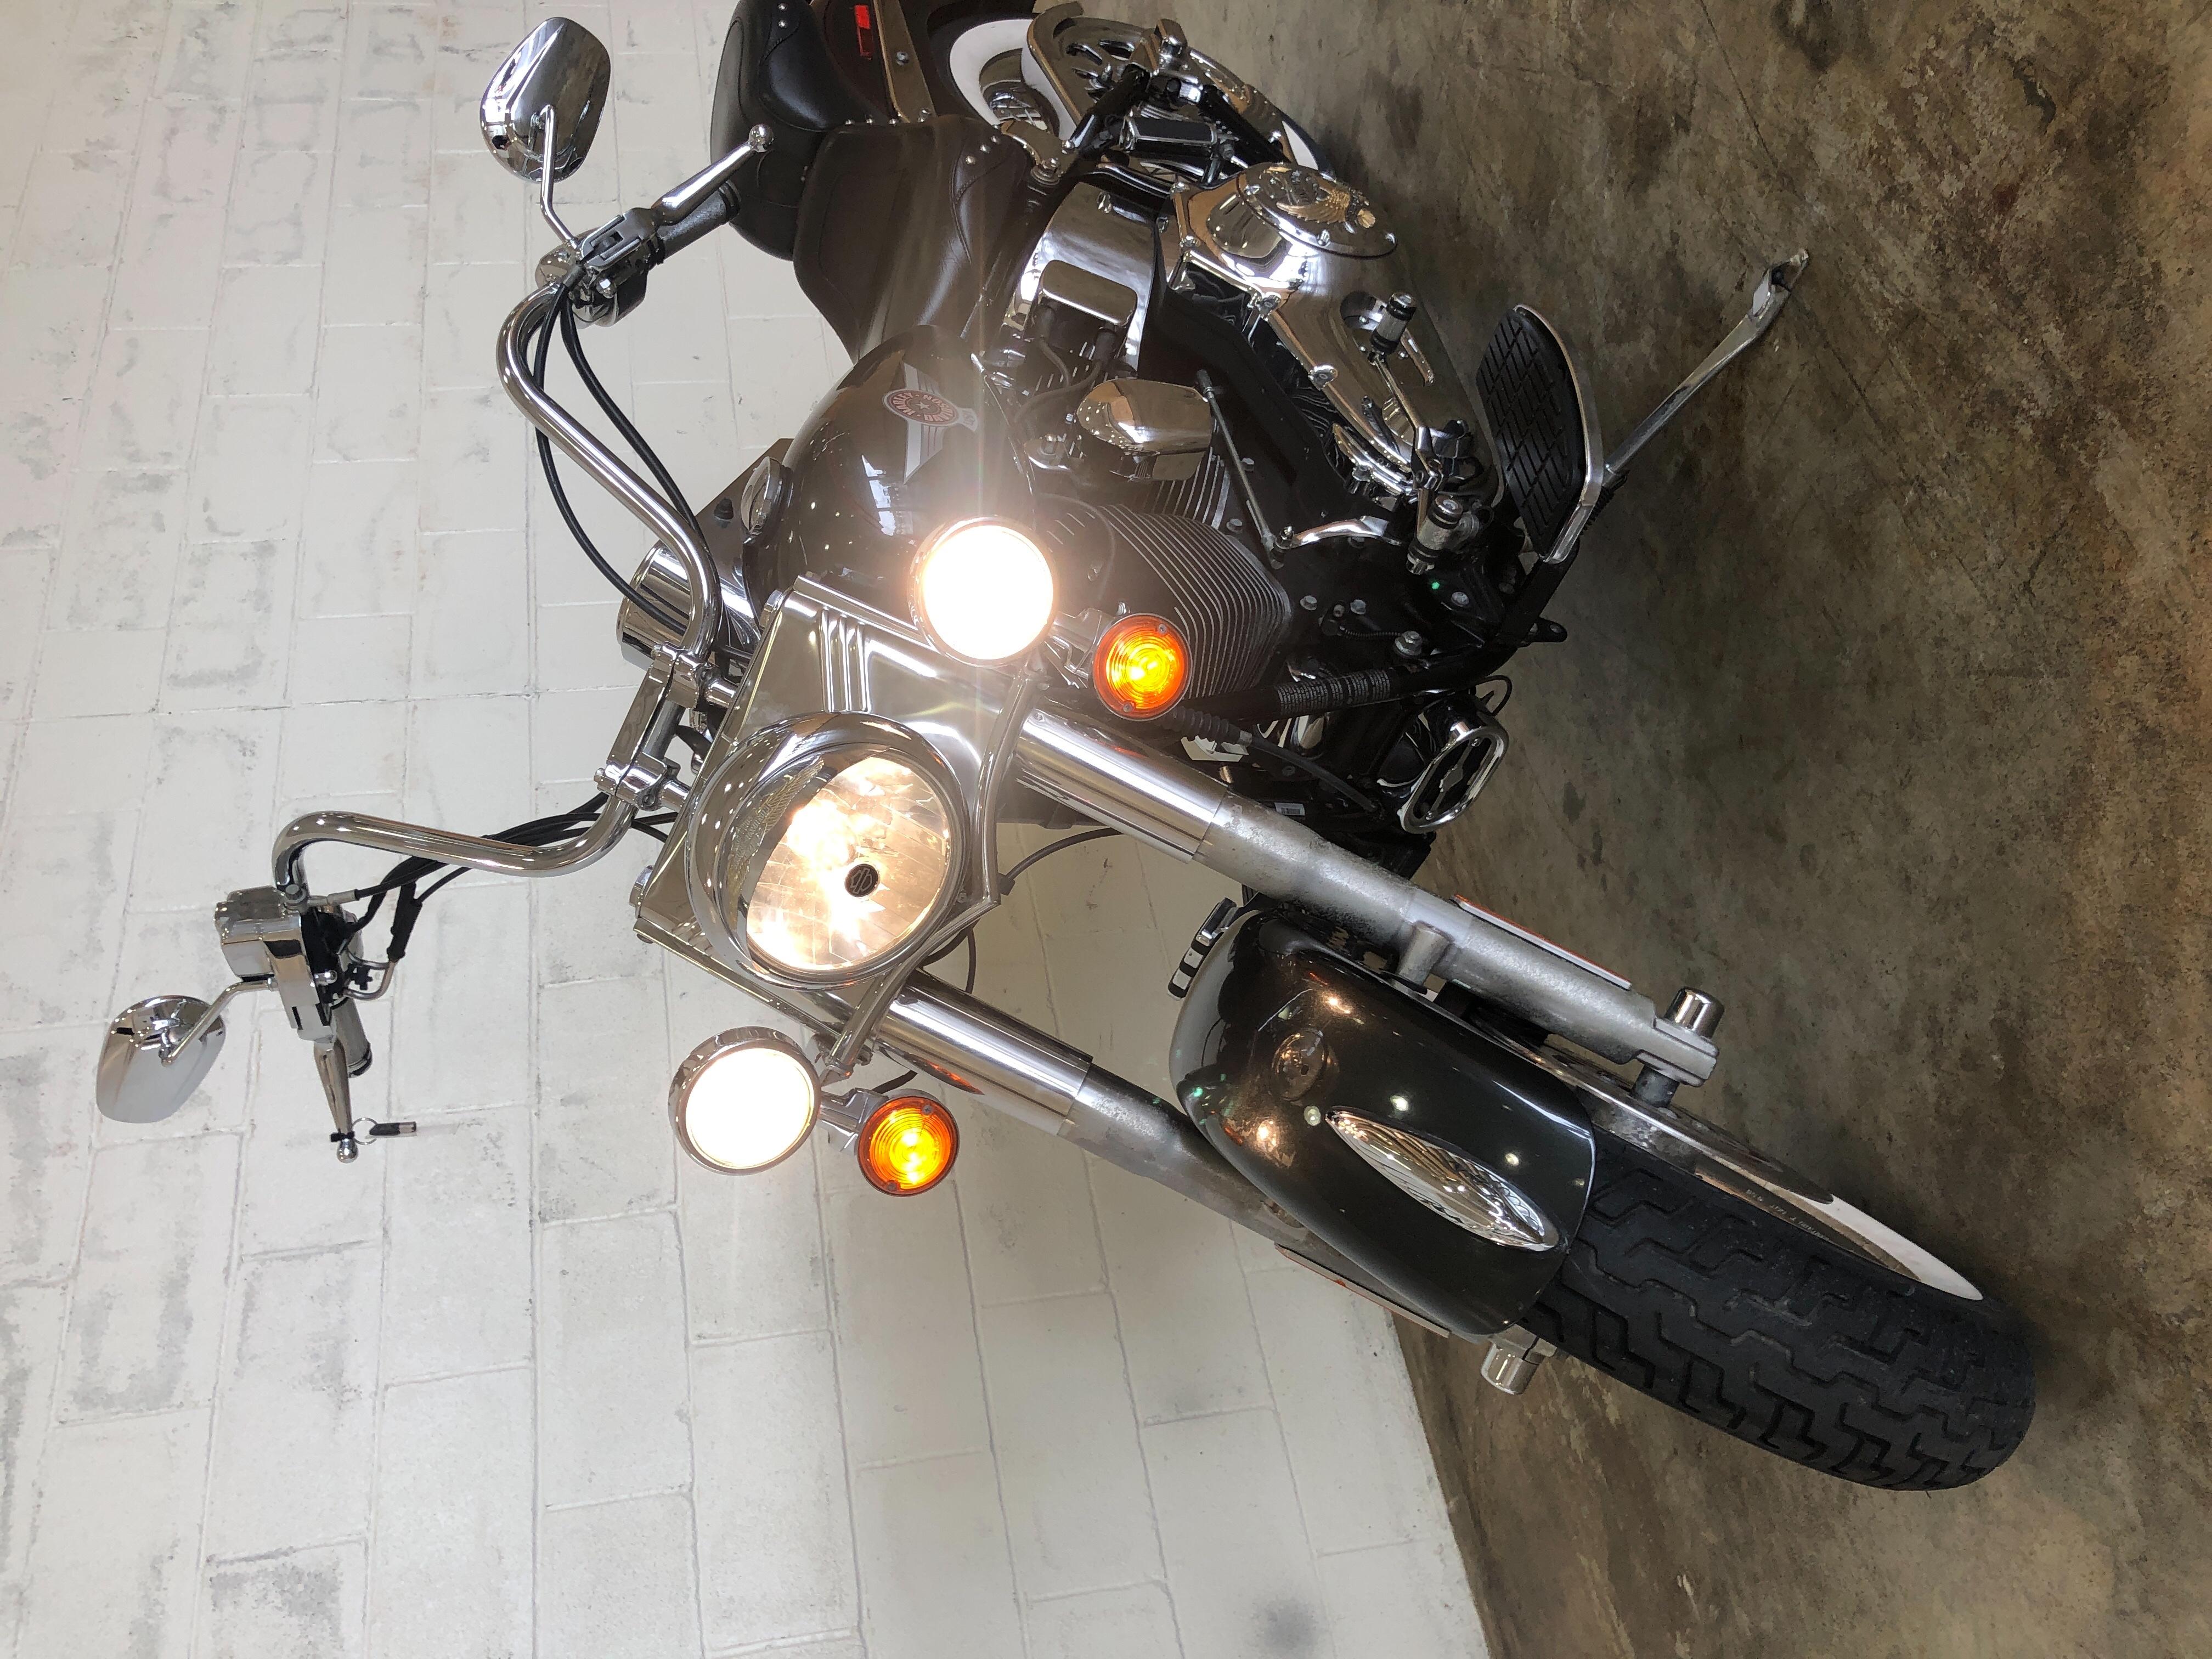 2006 Harley-Davidson Softail Fat Boy at Twisted Cycles